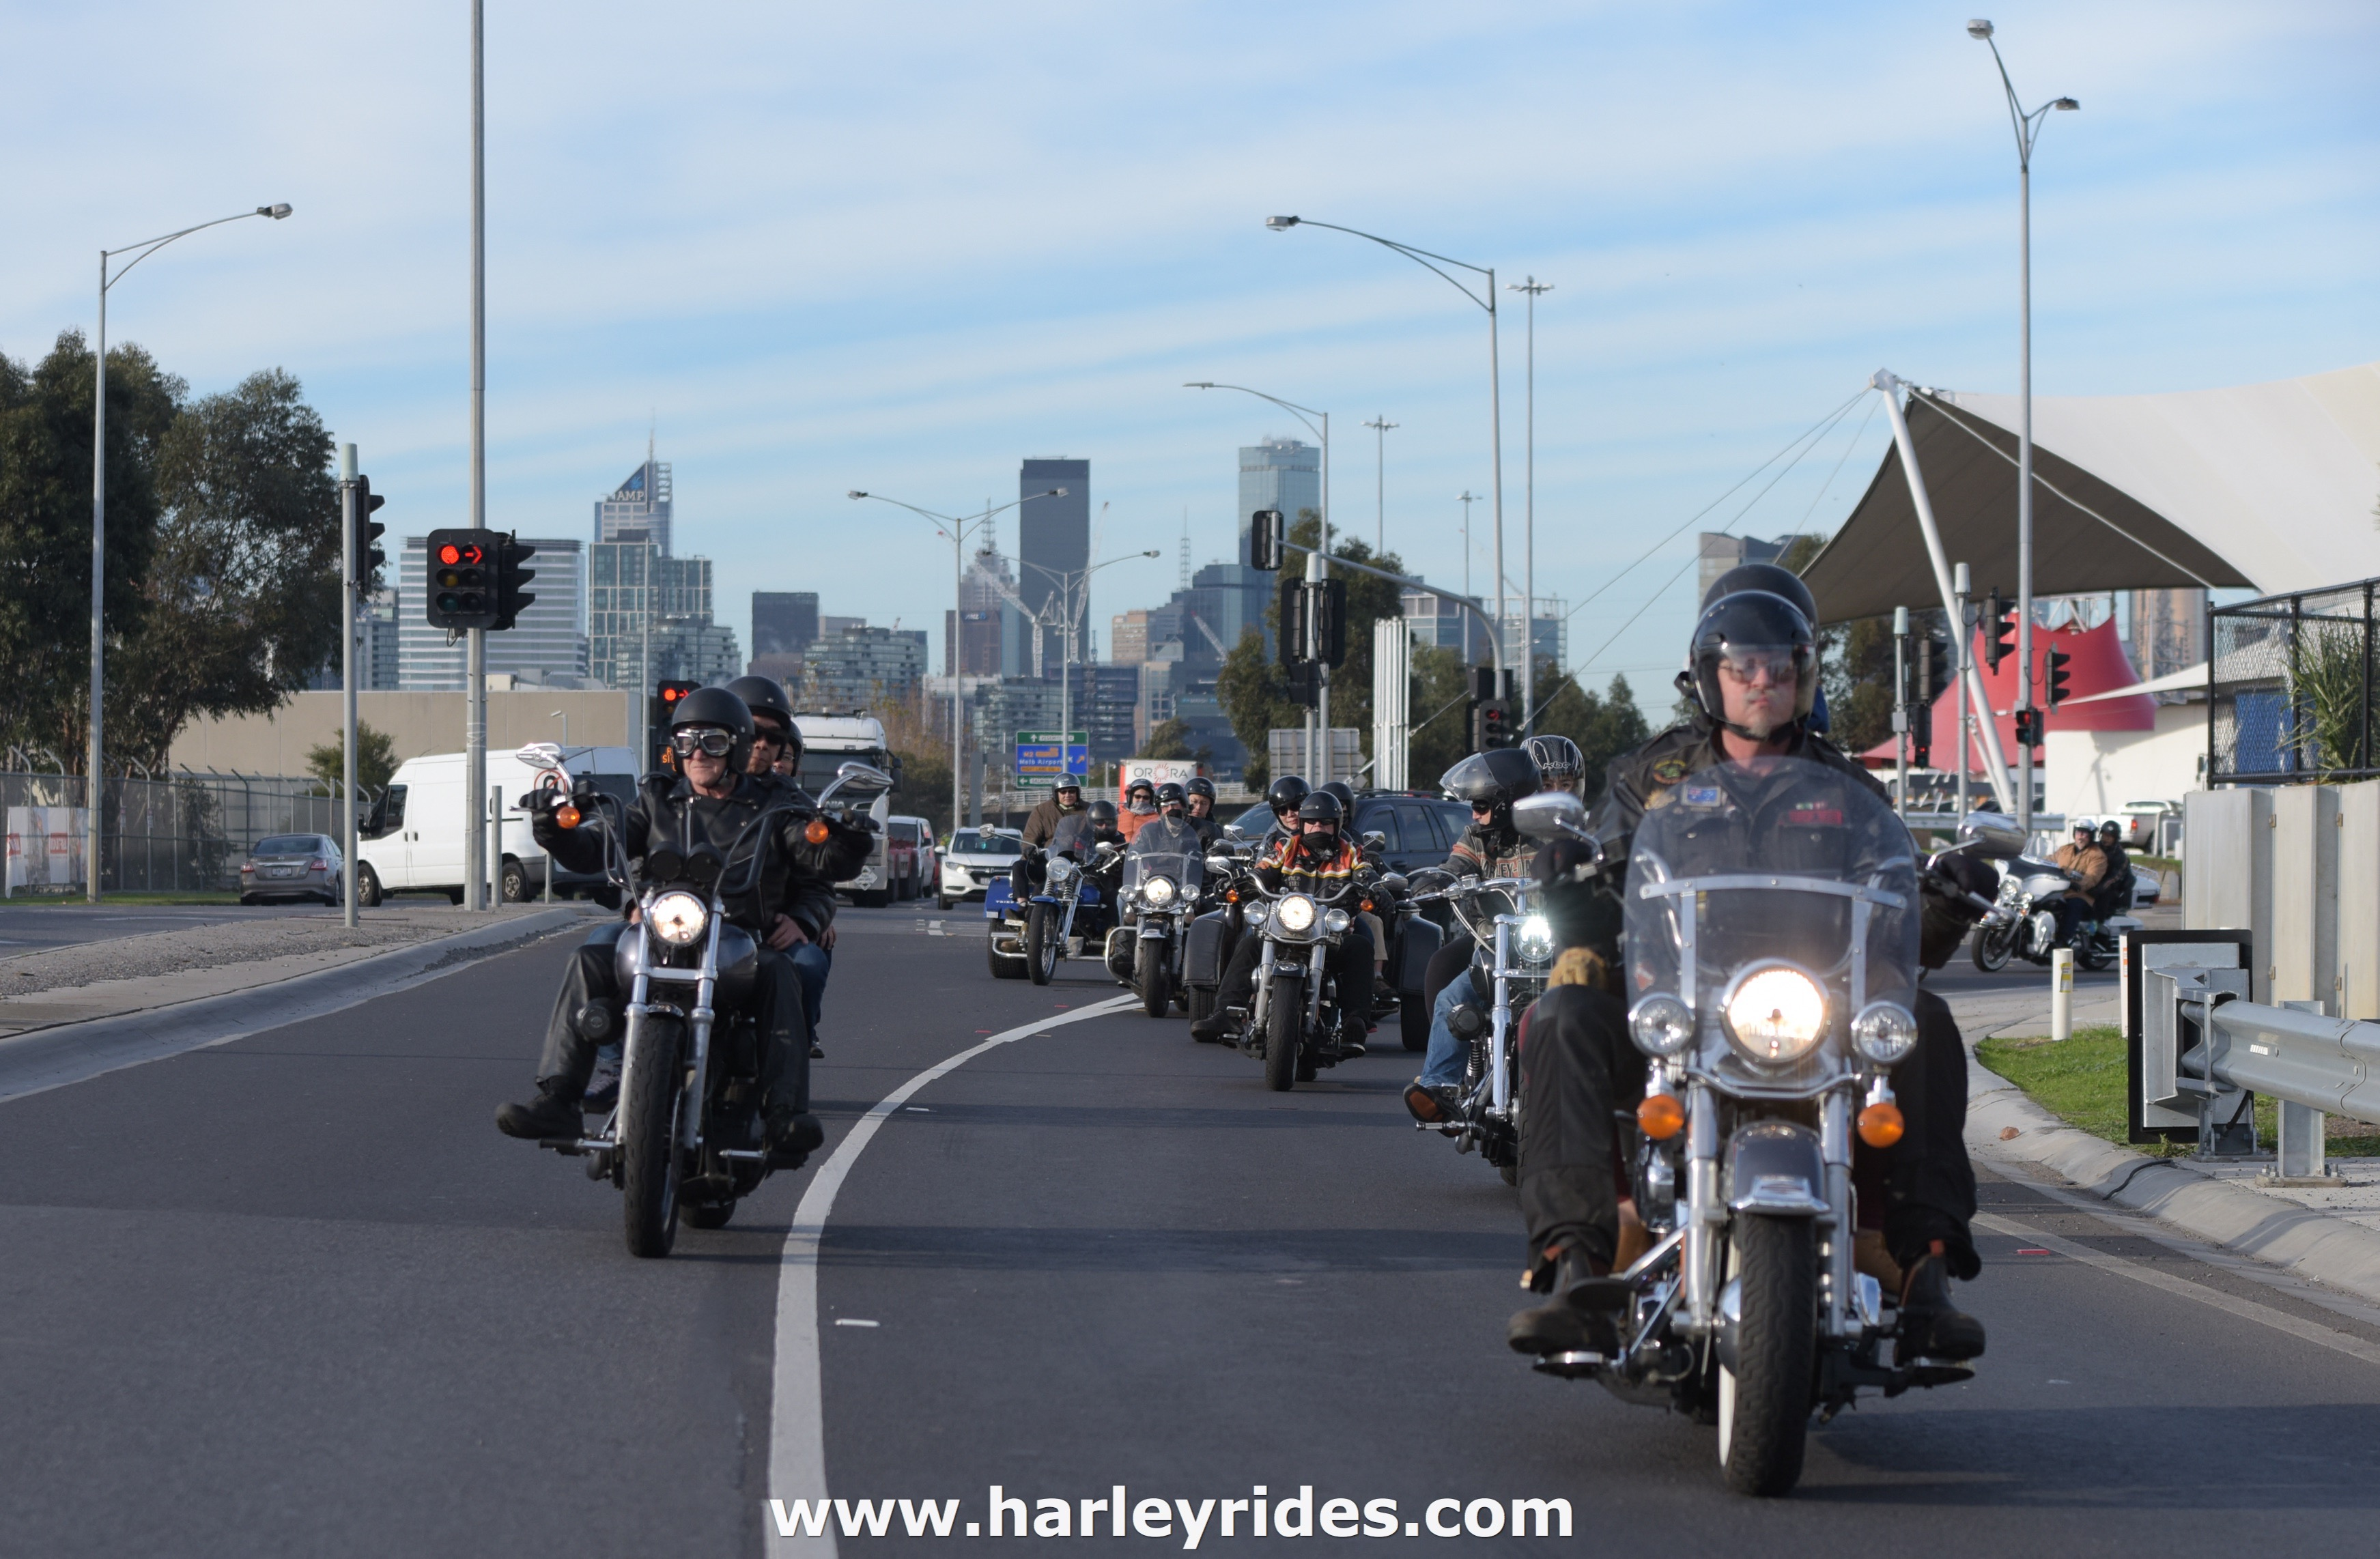 HarleyDavidsonGroupRide (13).jpg